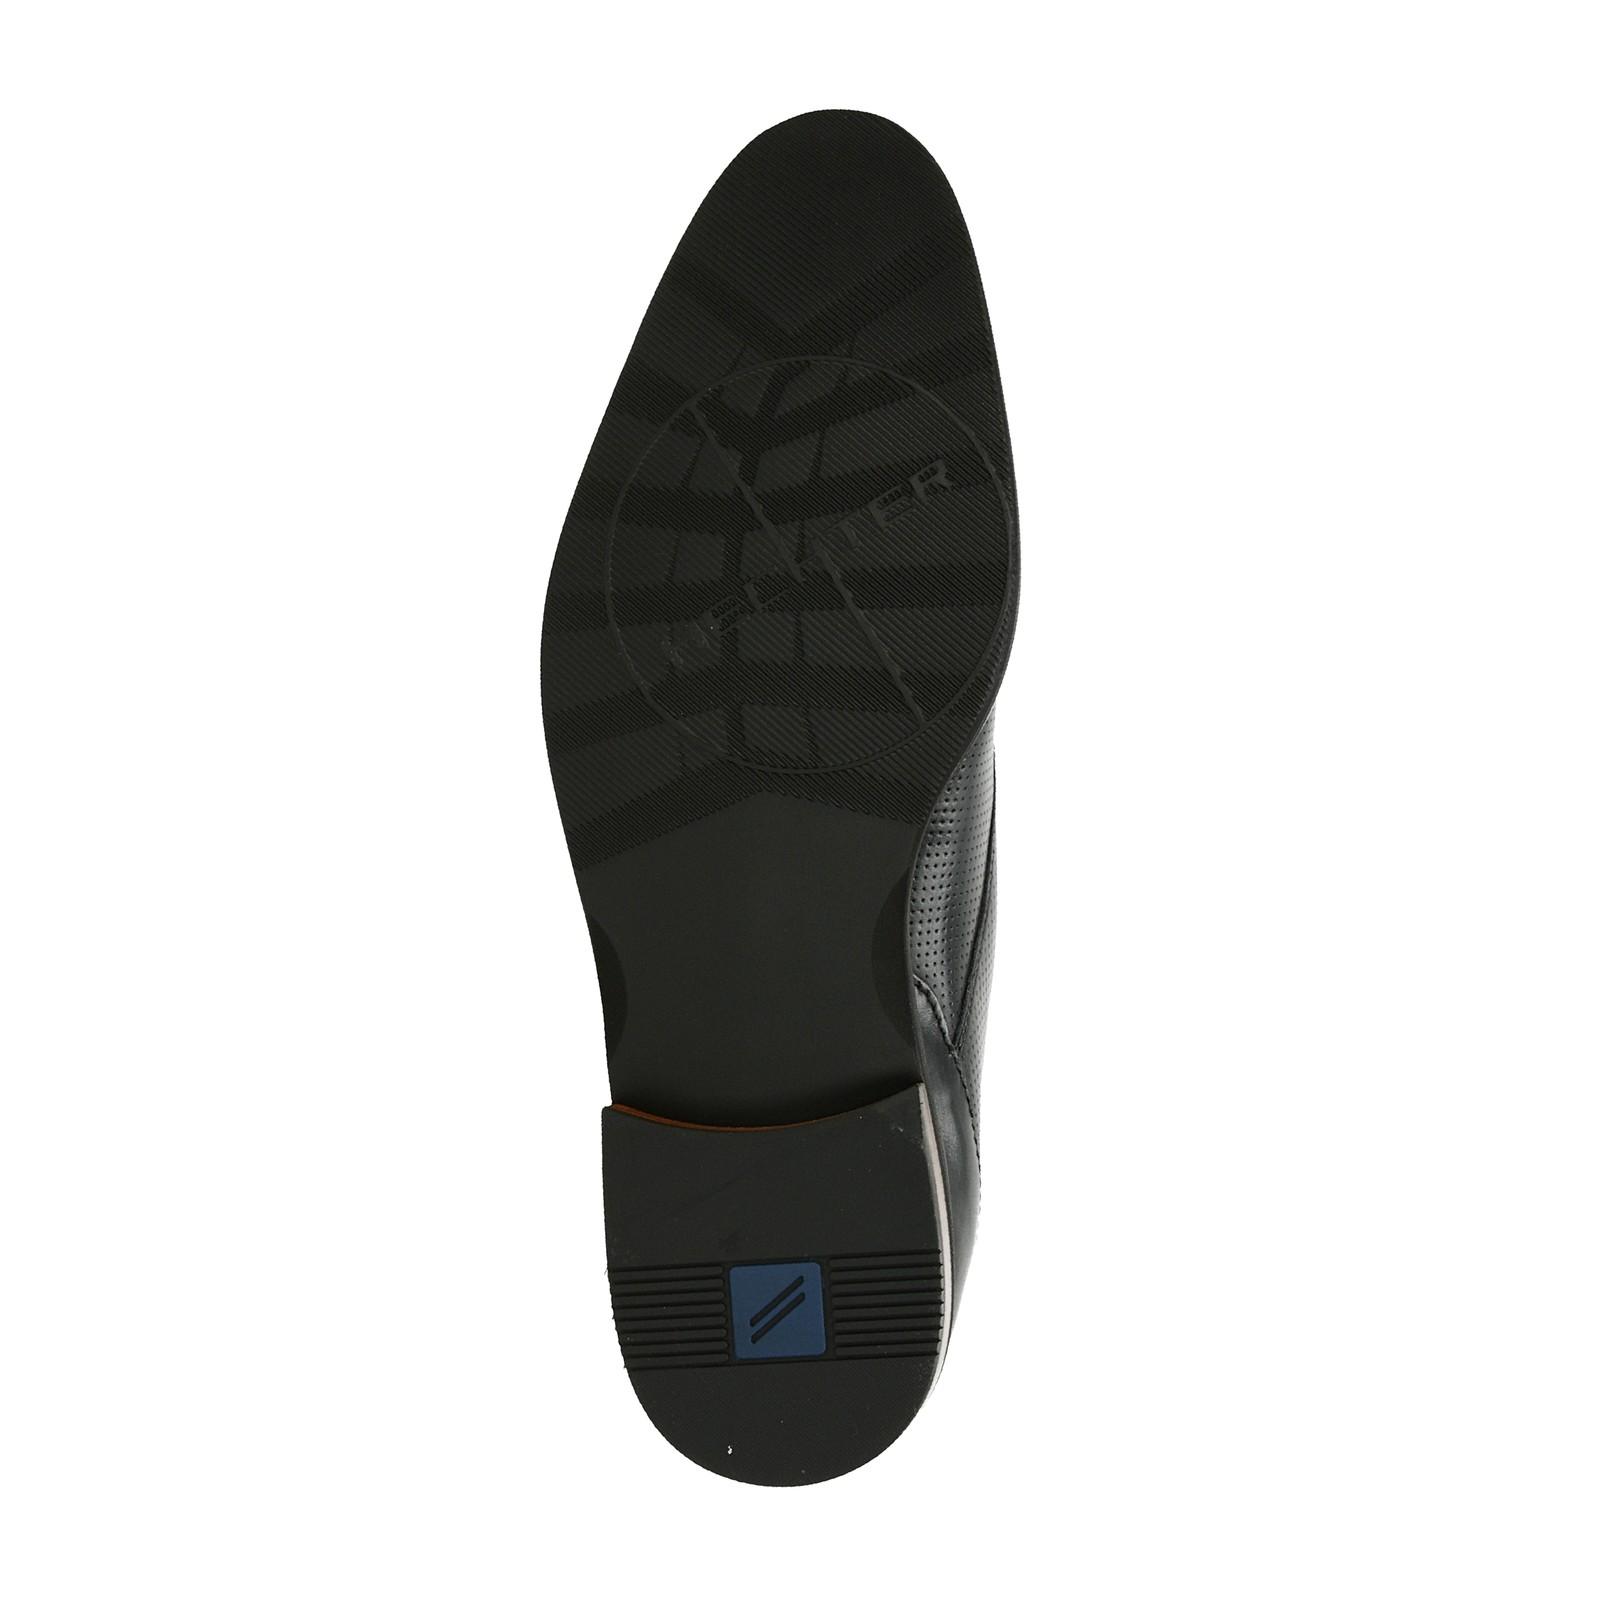 27206d1ced62 ... Daniel Hechter pánske kožené spoločenské topánky - čierne ...